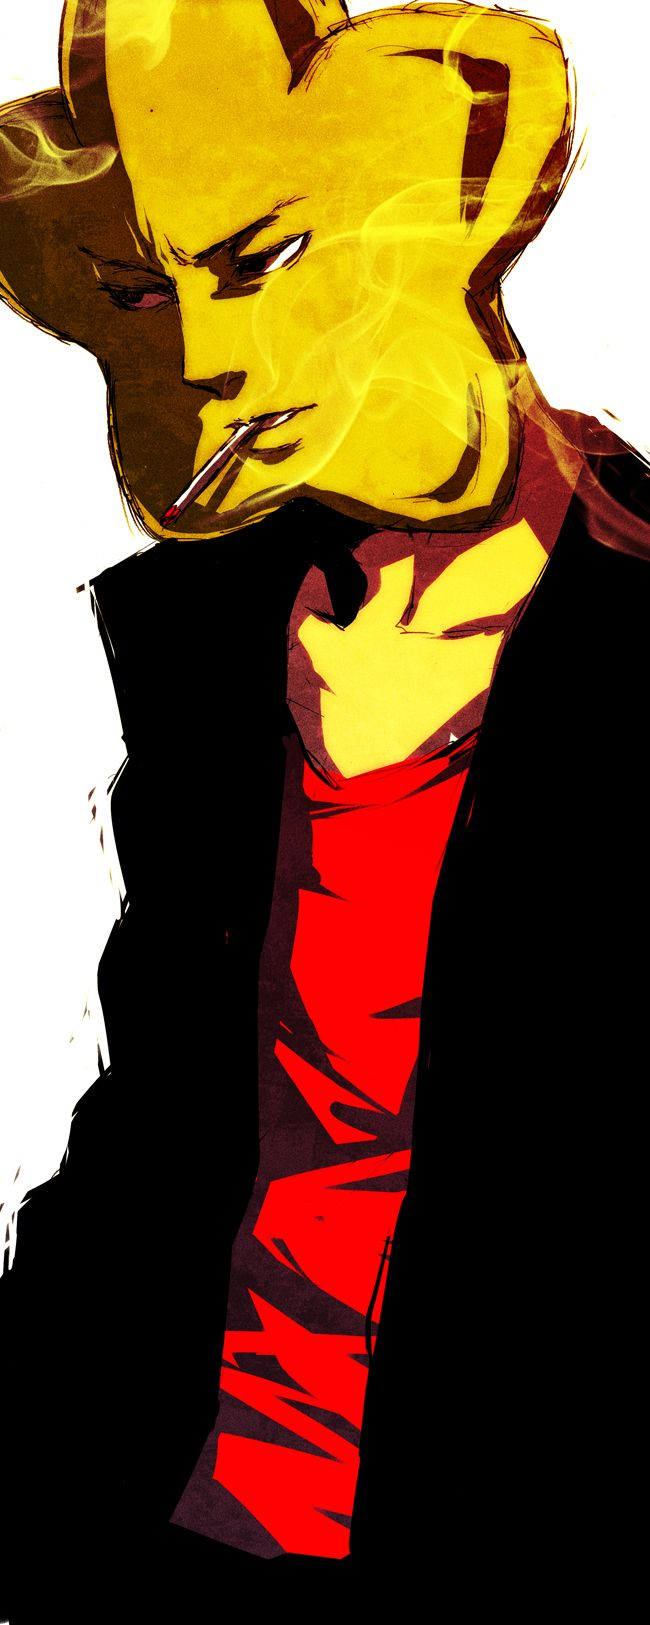 Hoshi Arakawa Under The Bridge Anime Manga